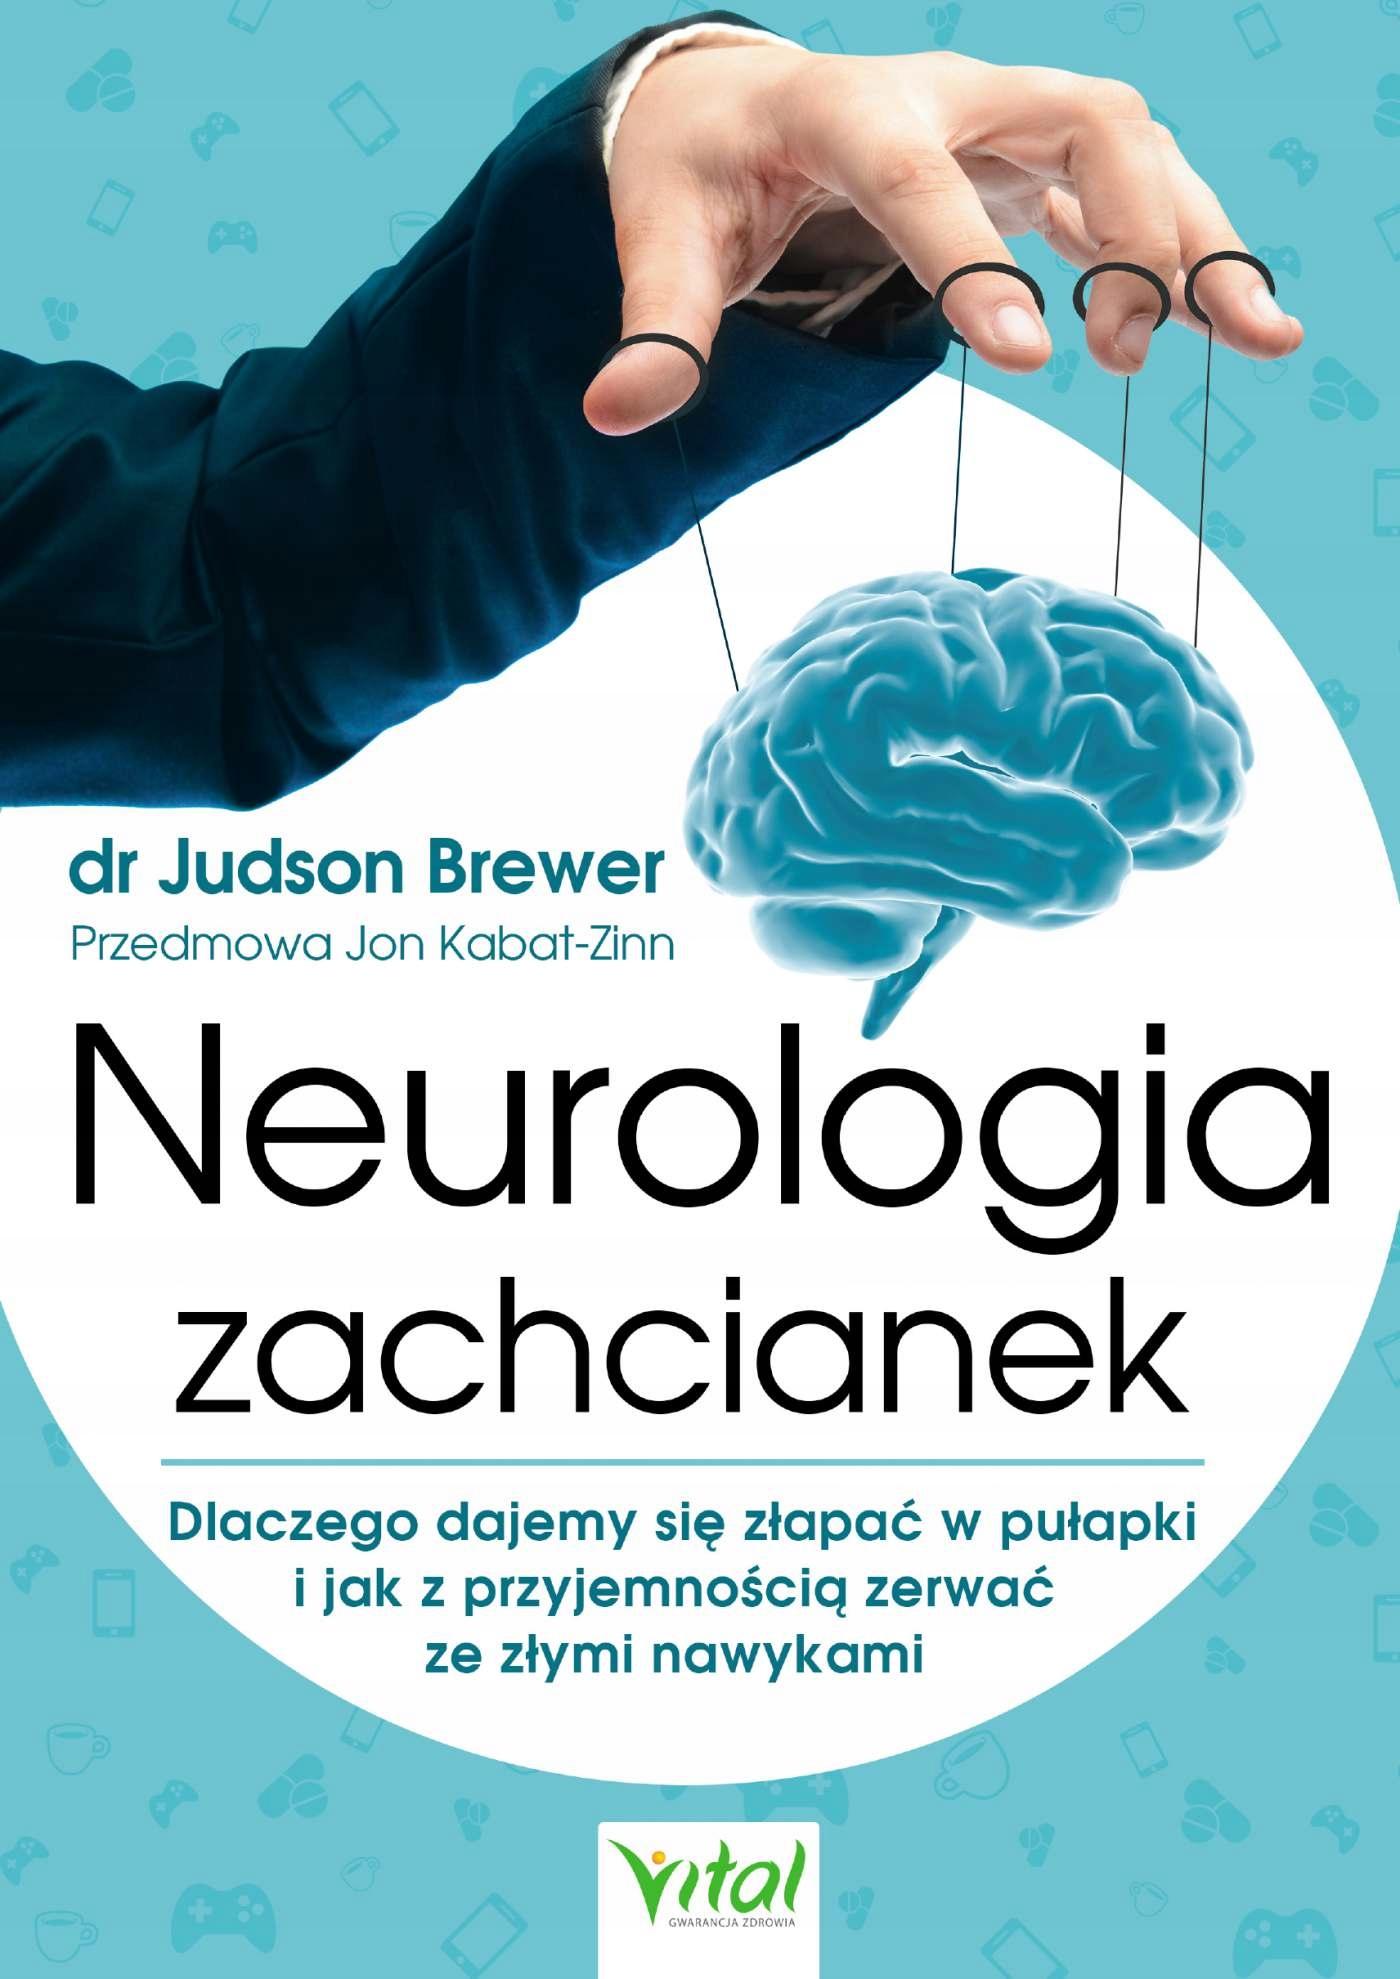 Neurologia zachcianek. dr Judson Brewer